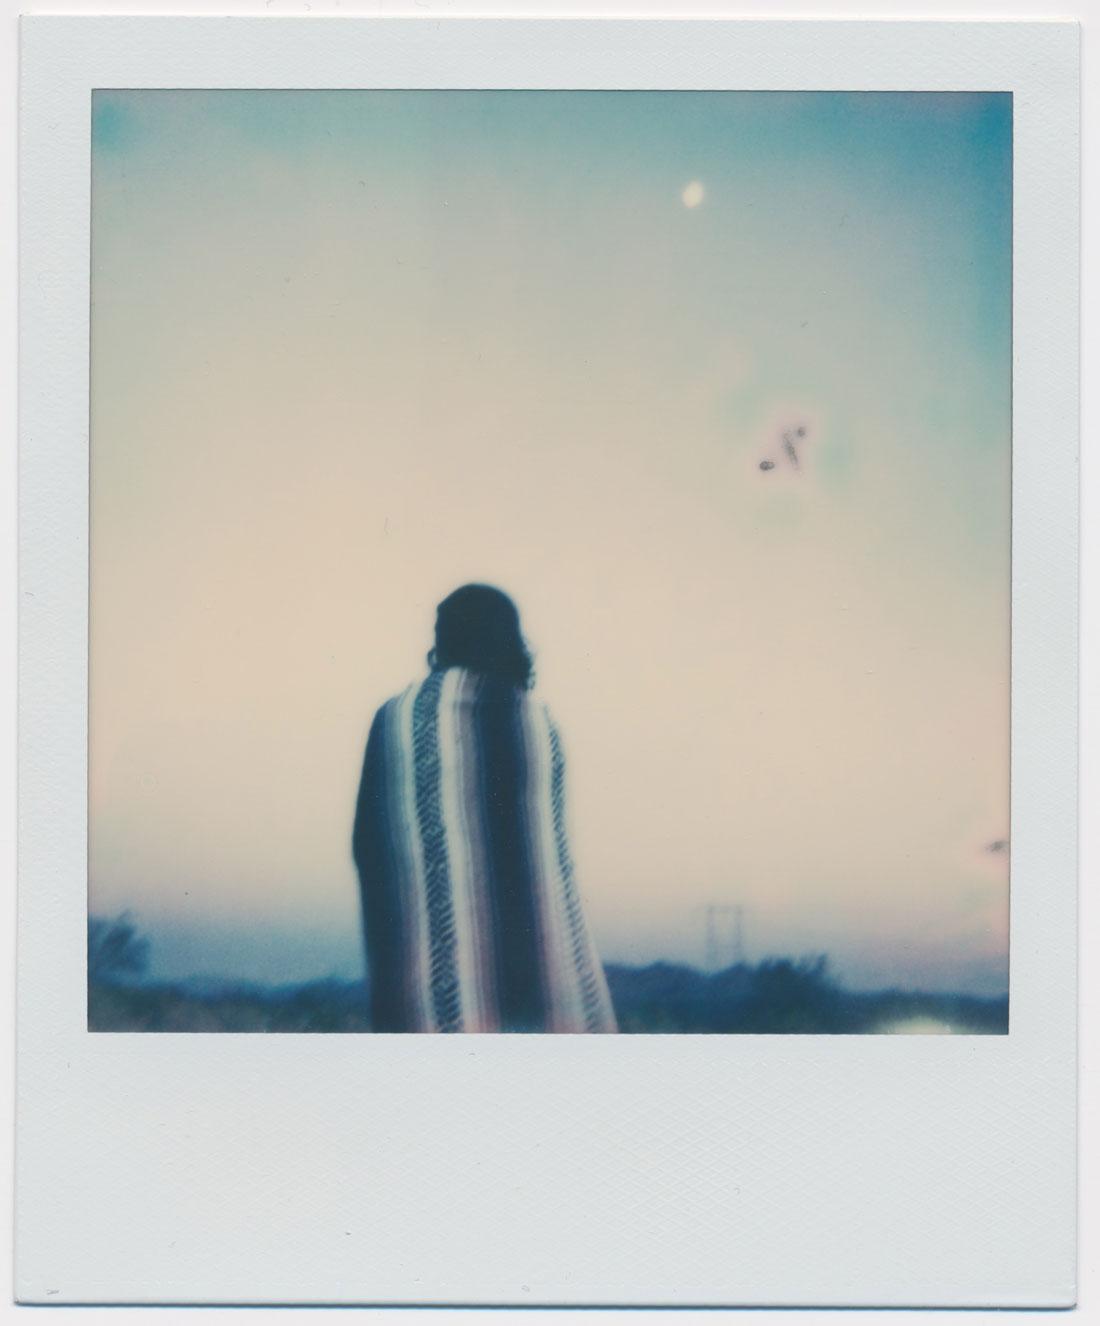 christina_choi_cxchoi_polaroid_5.jpg